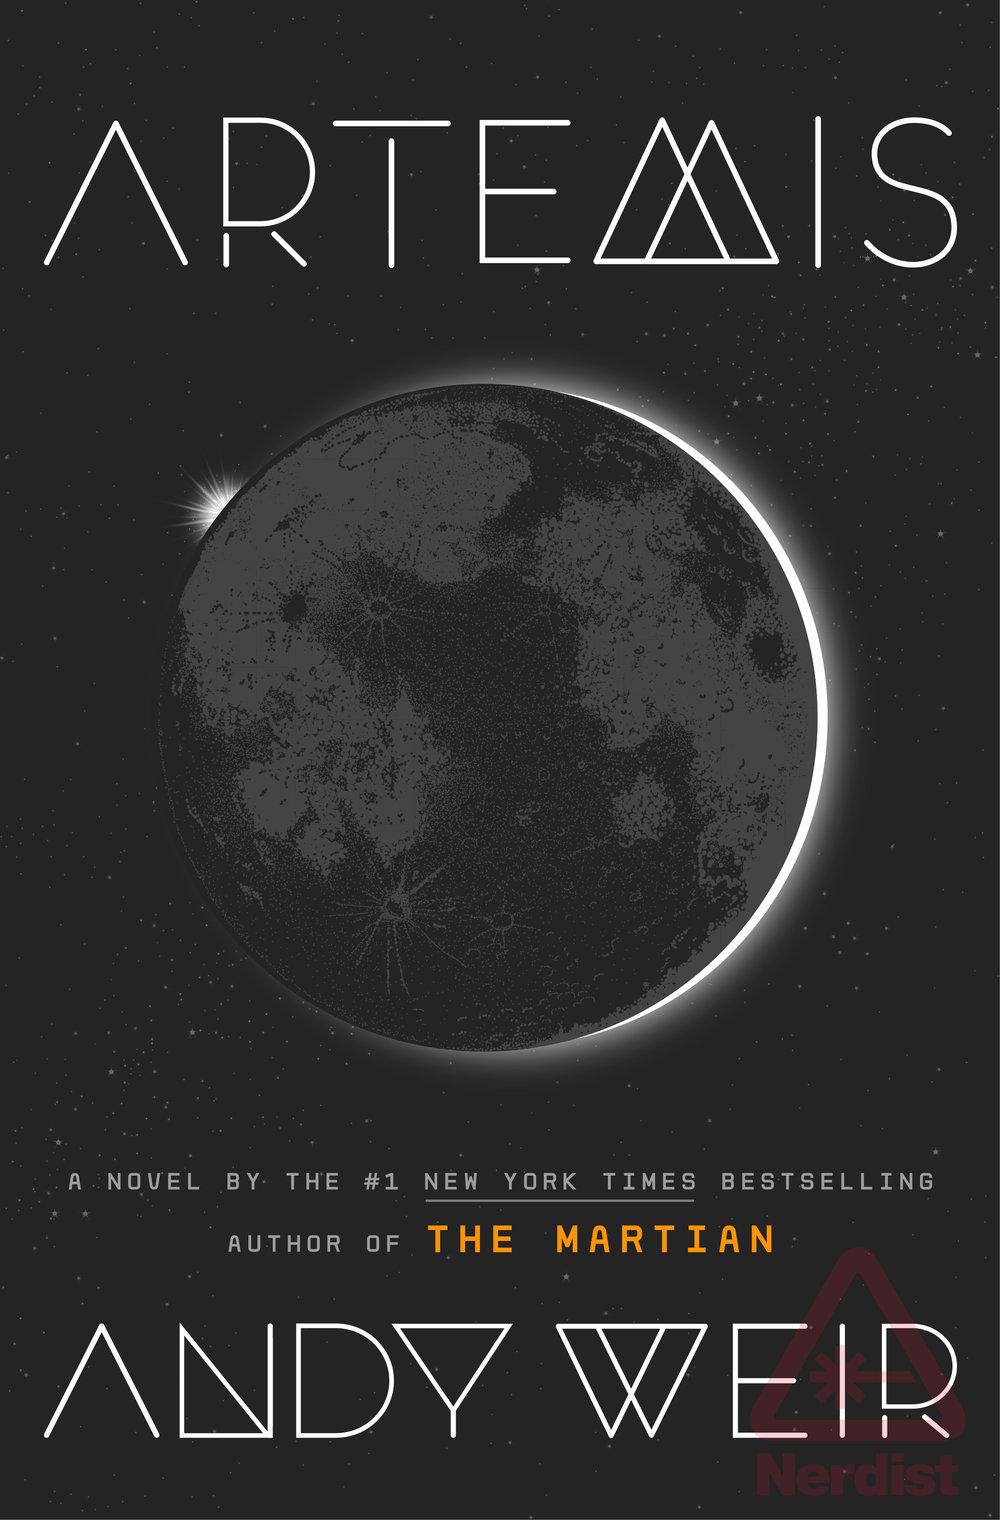 Artemis-Book-Cover-Andy-Weir.jpg